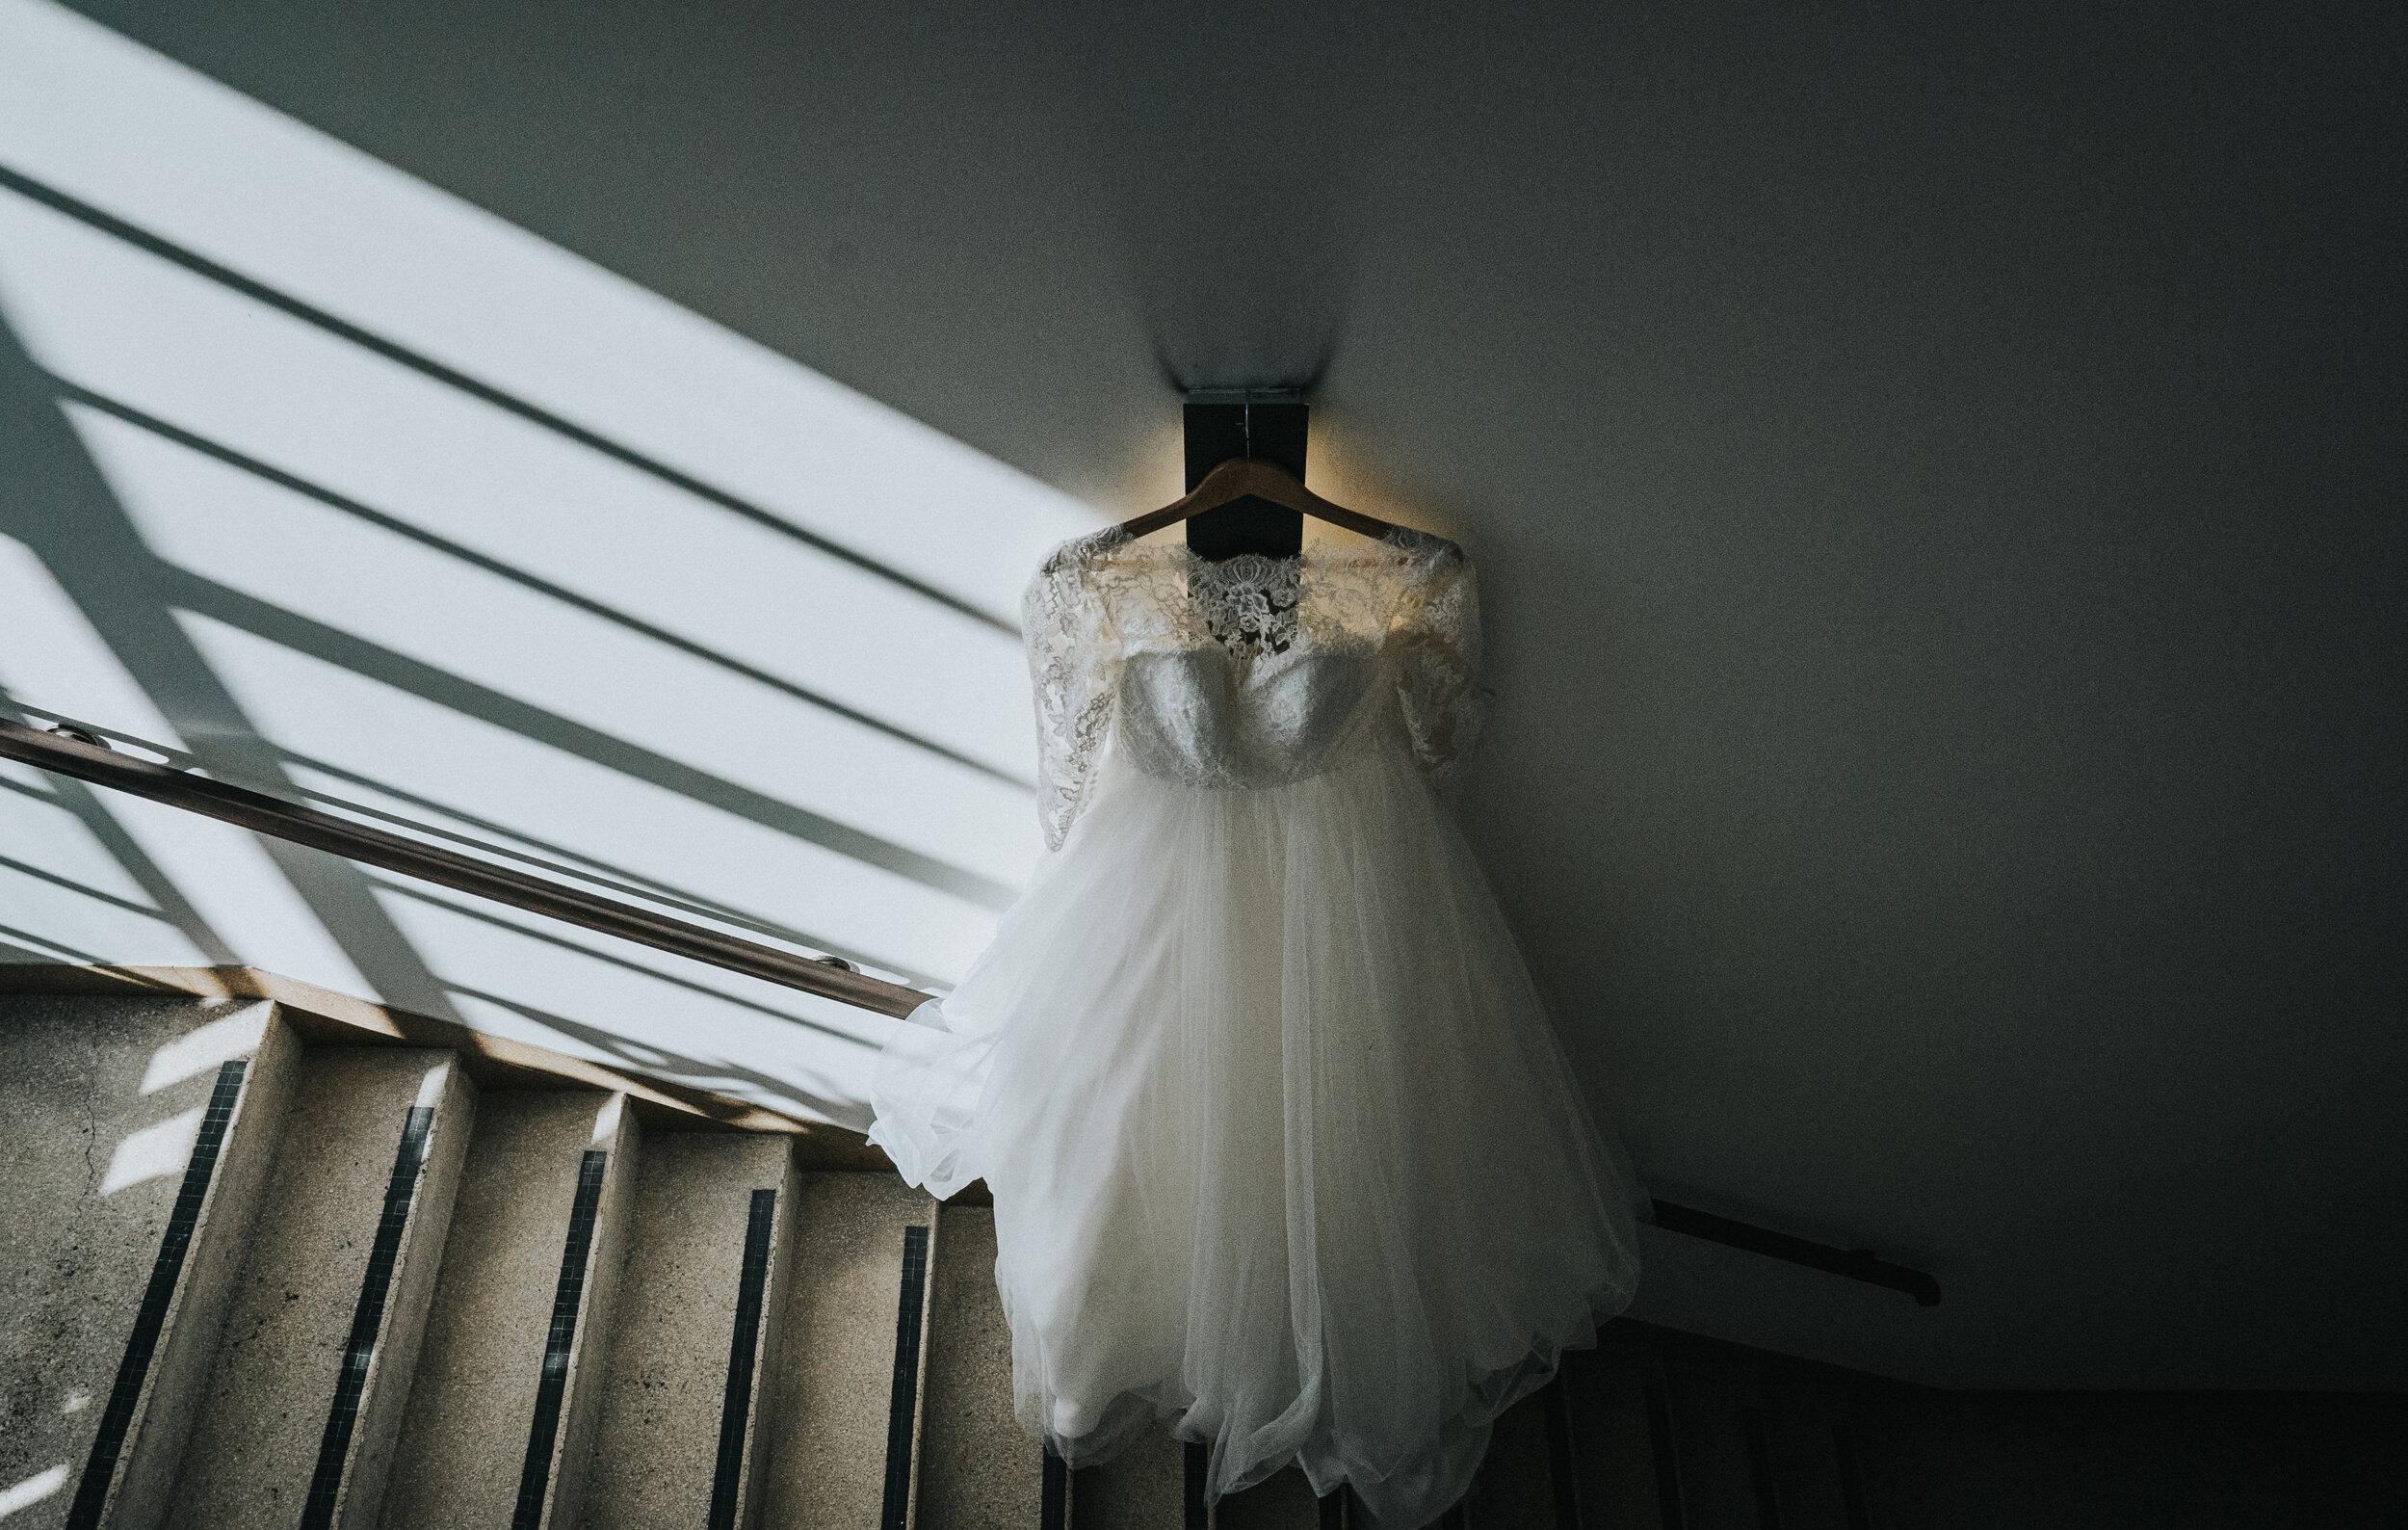 east-london-wedding-photographer-videographer-patriot-square-apartments-06